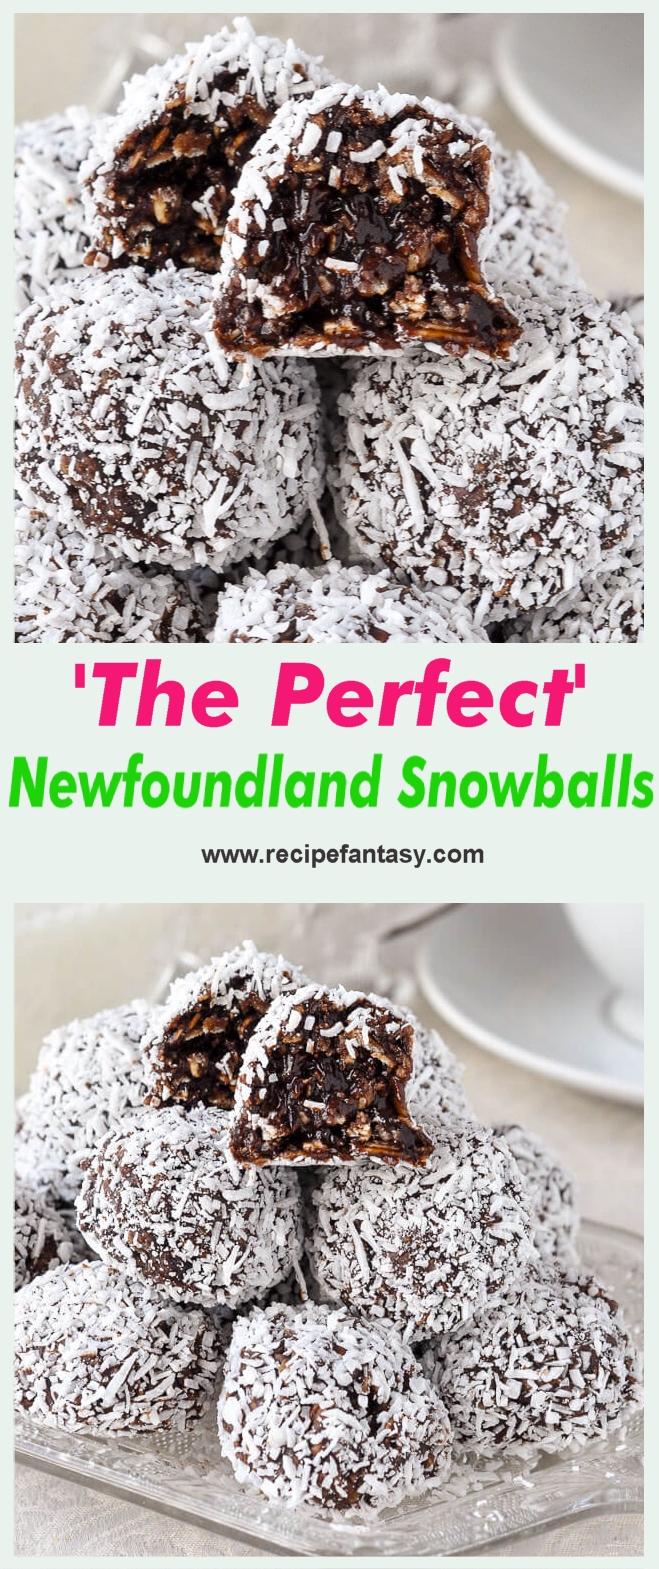 The Perfect Newfoundland Snowballs Recipe